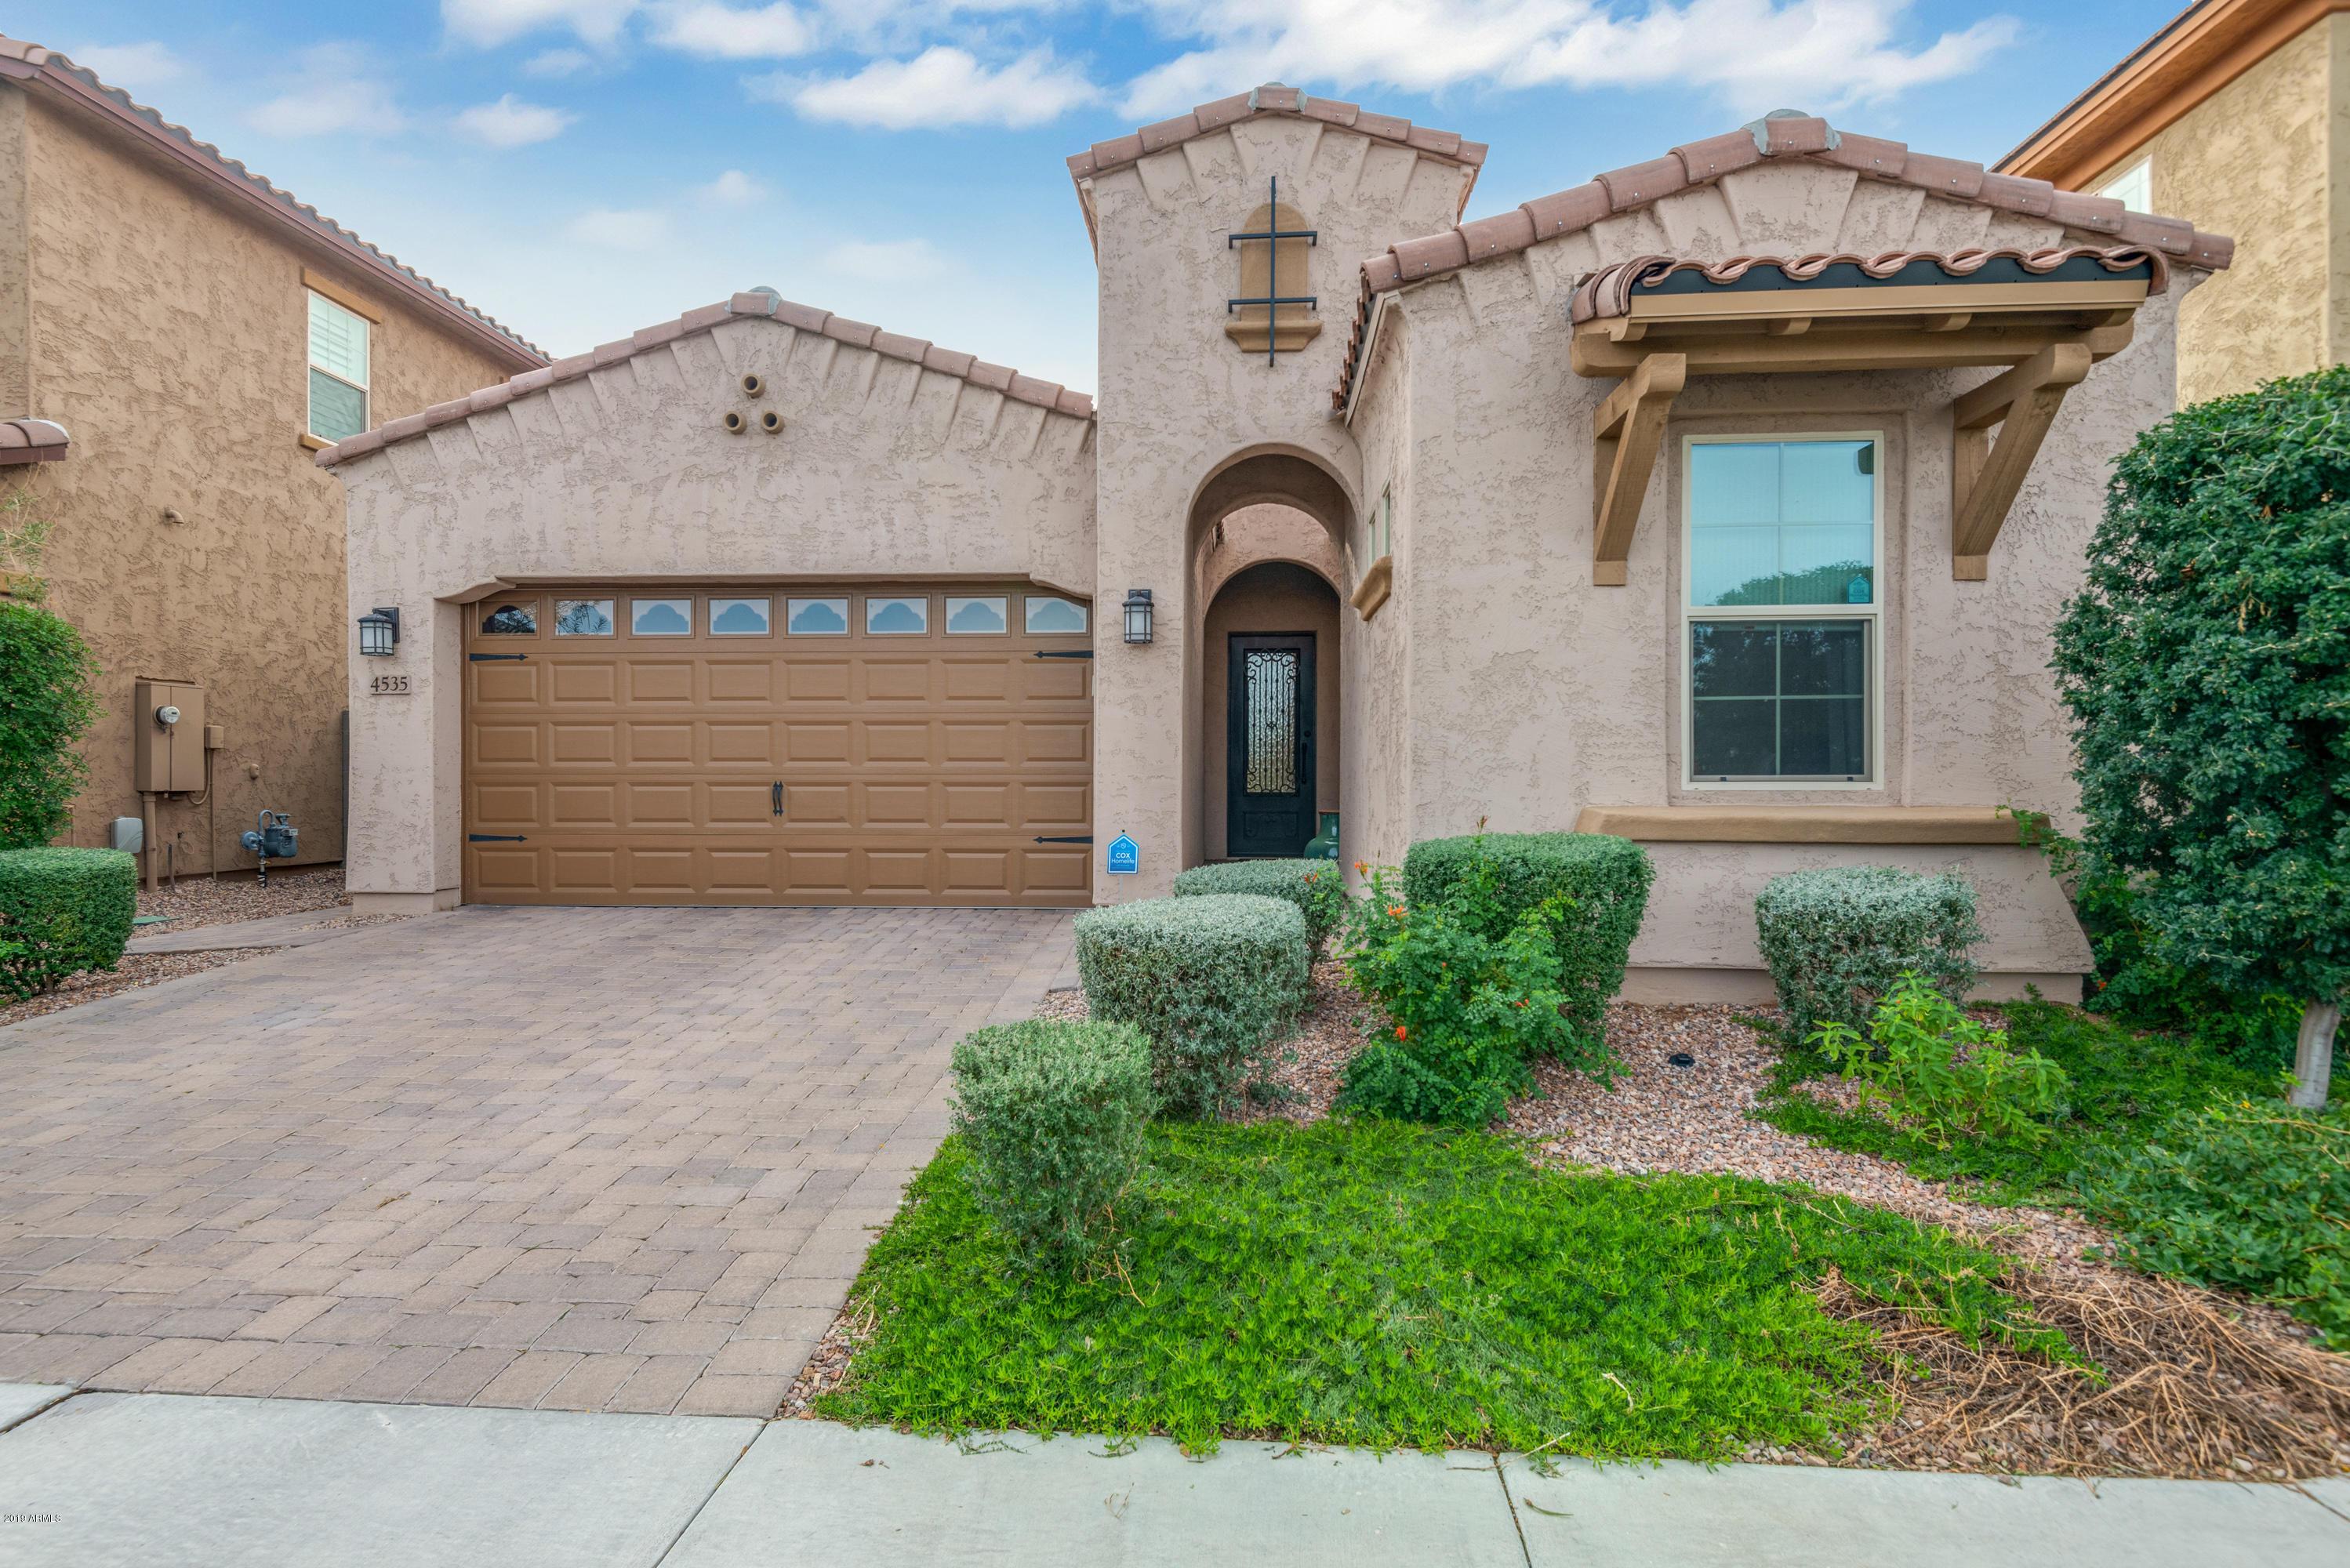 Photo of 4535 E NAVIGATOR Lane, Phoenix, AZ 85050